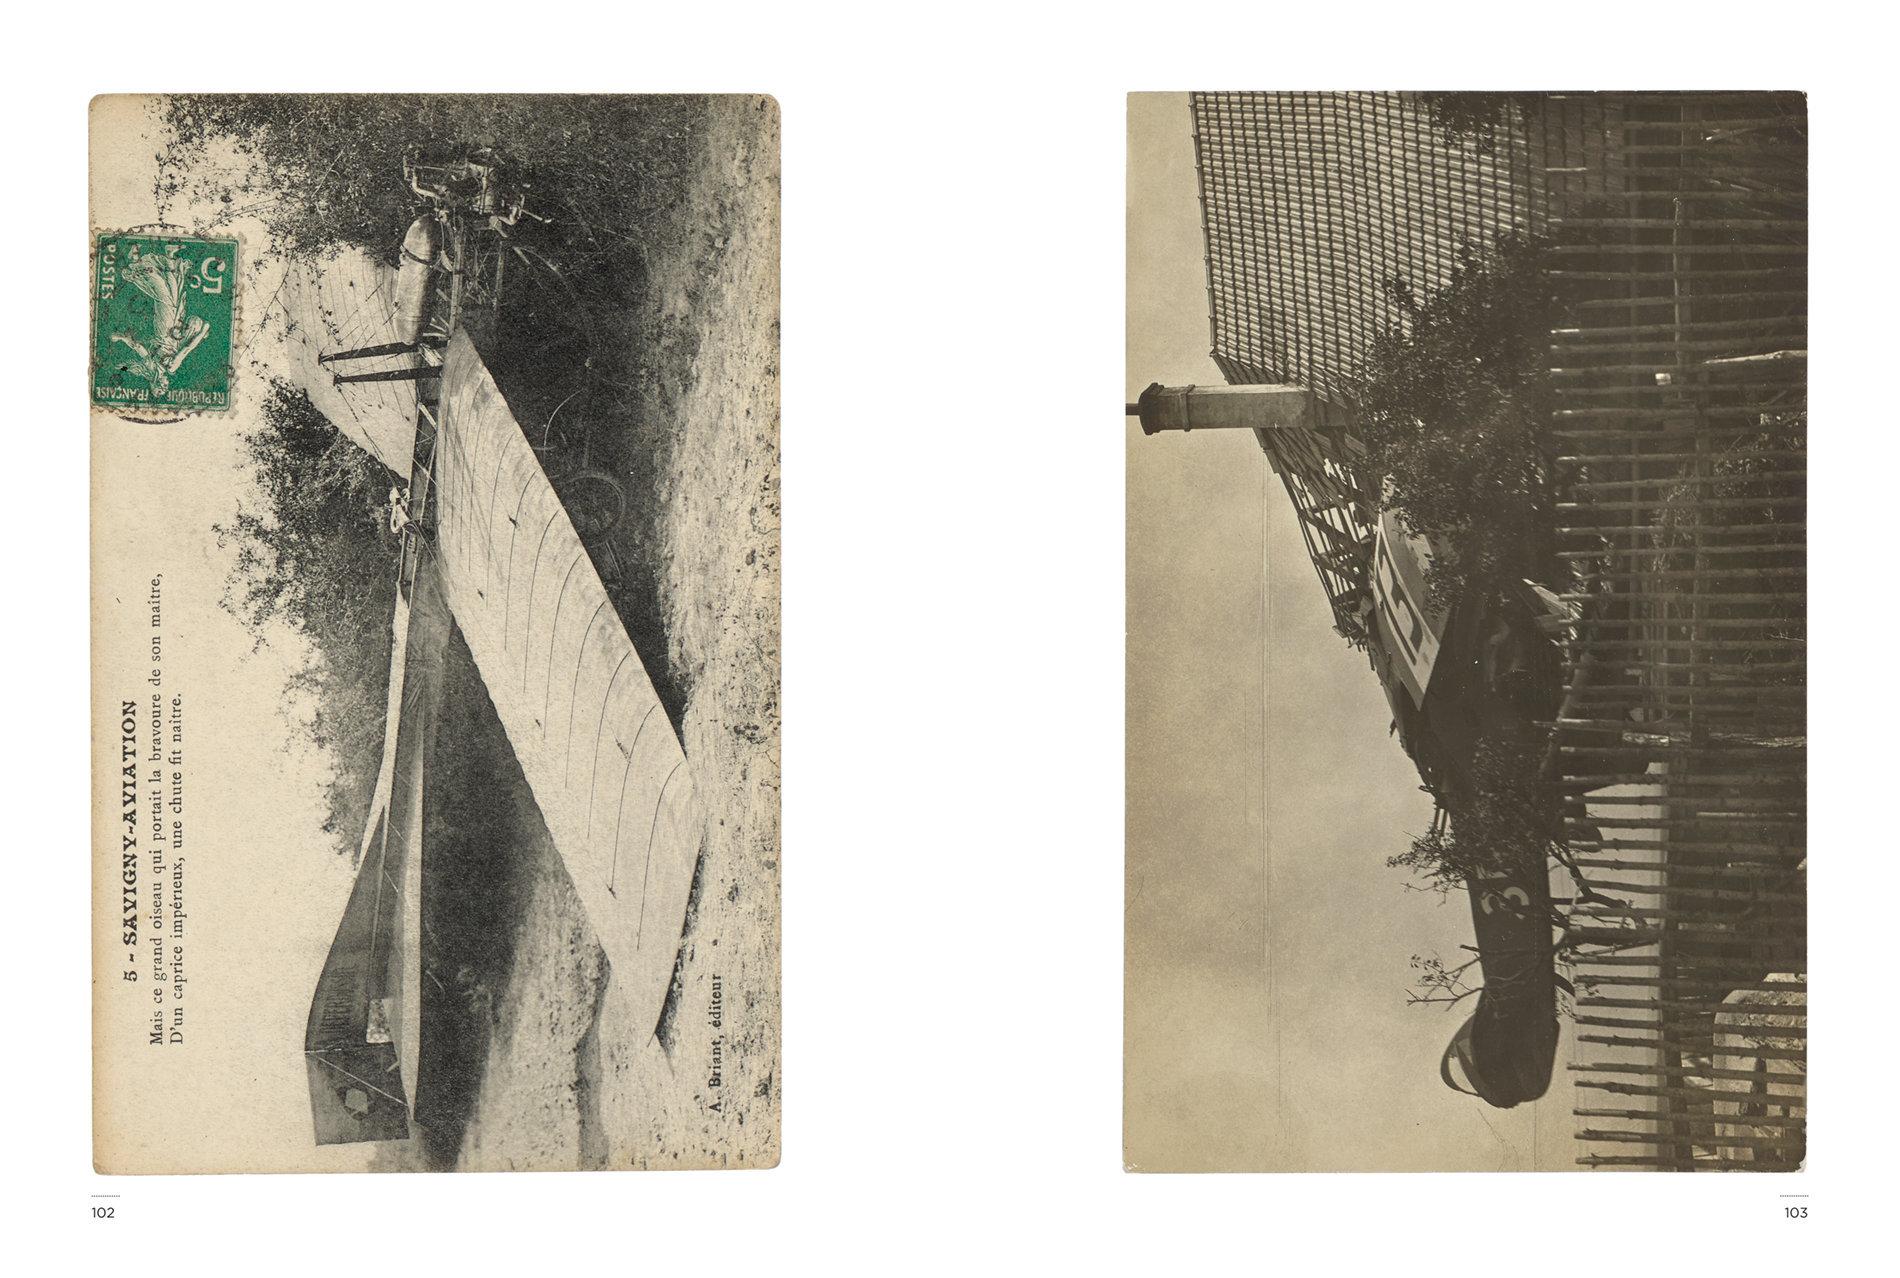 Kasmin's Postcards - Wreck